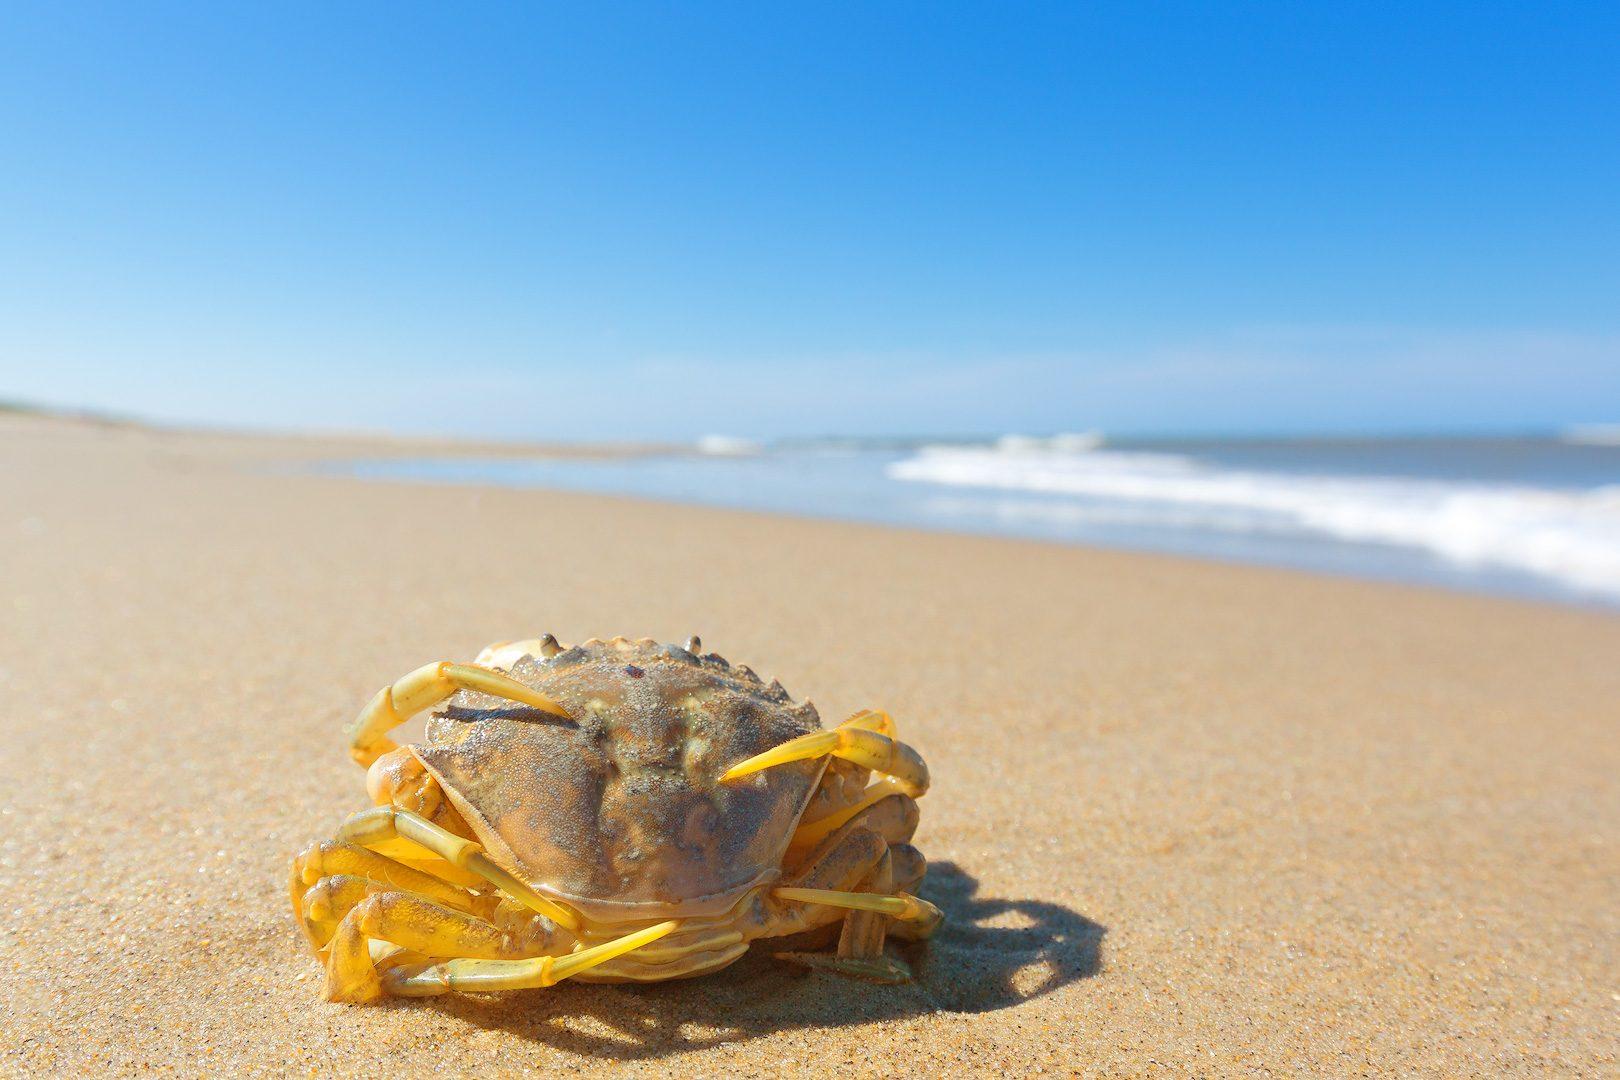 foto-krab-strand-natuur